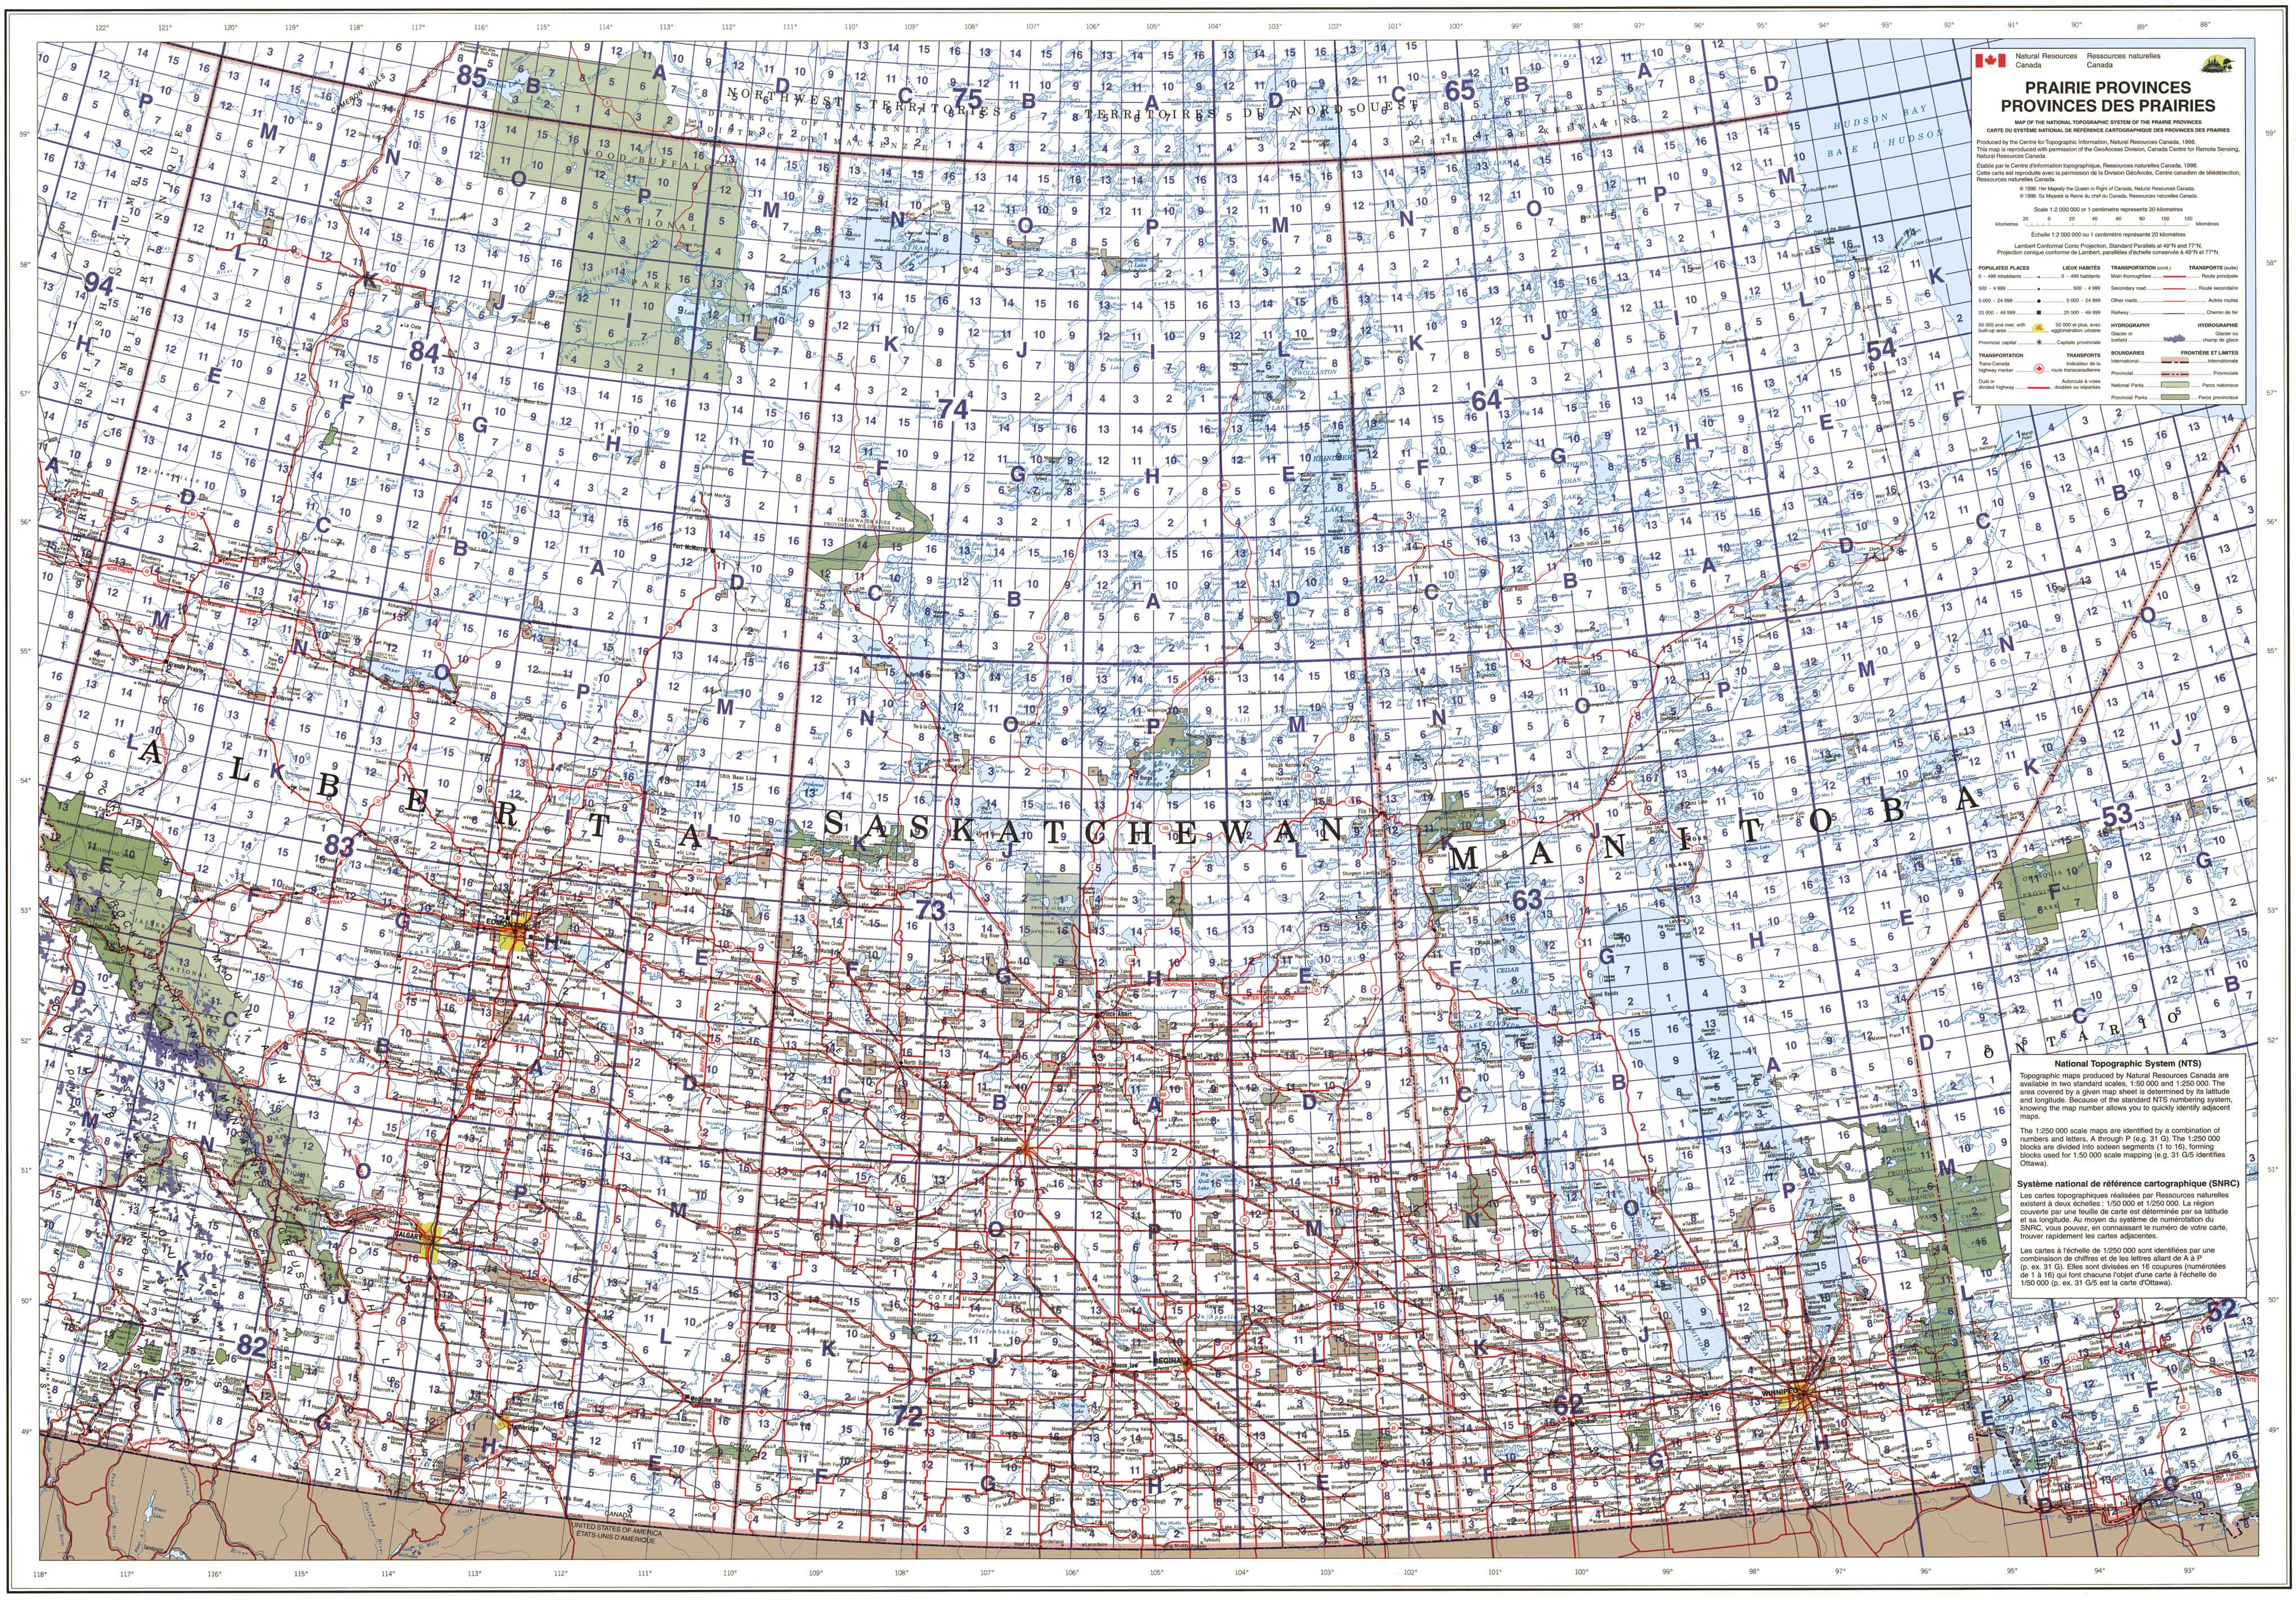 alberta saskatchewan manitoba topographic map index